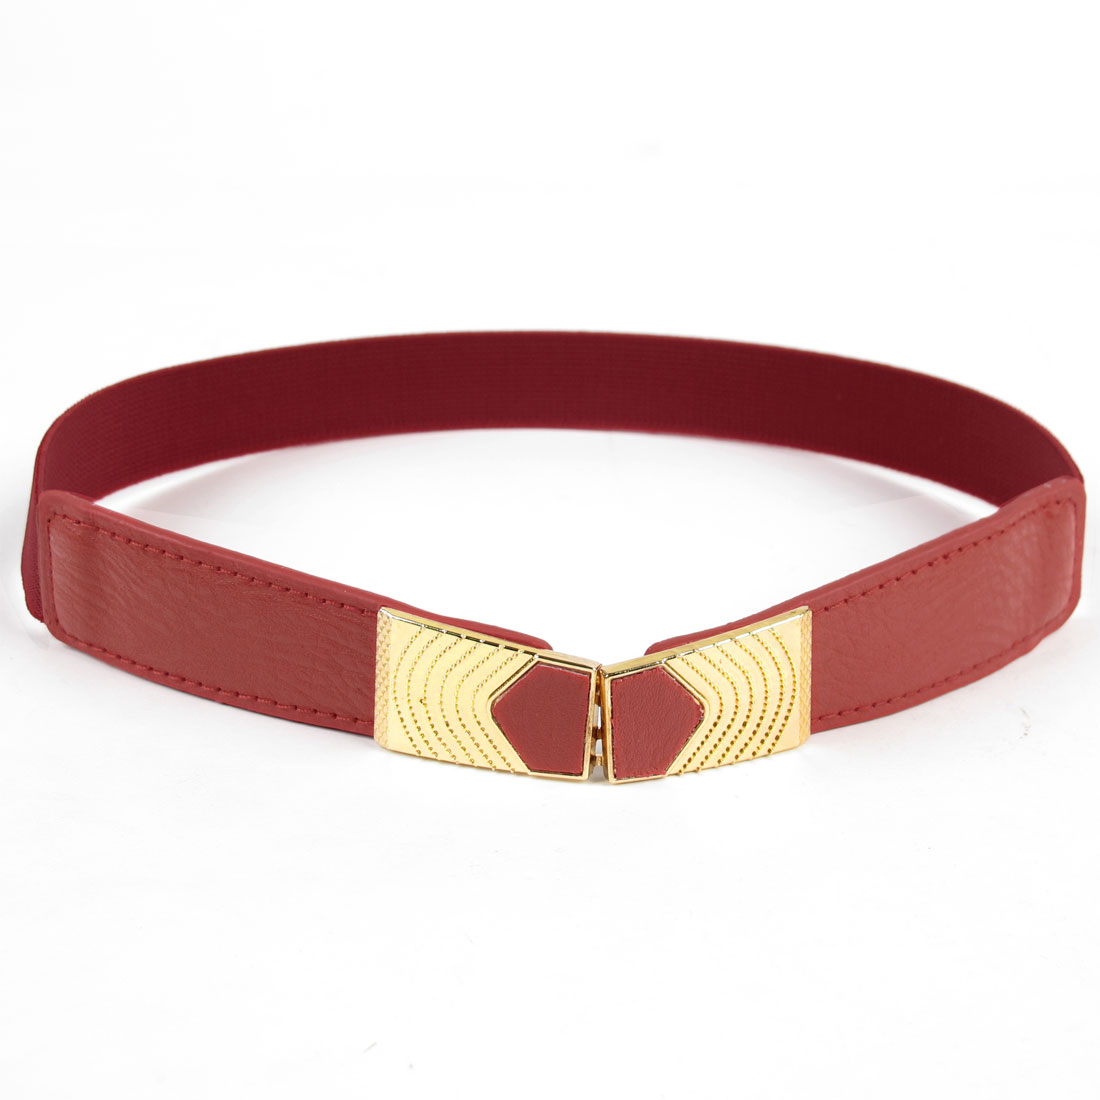 Lady Gold Tone Metal Interlocking Buckle Waistbelt Cinch Belt Red